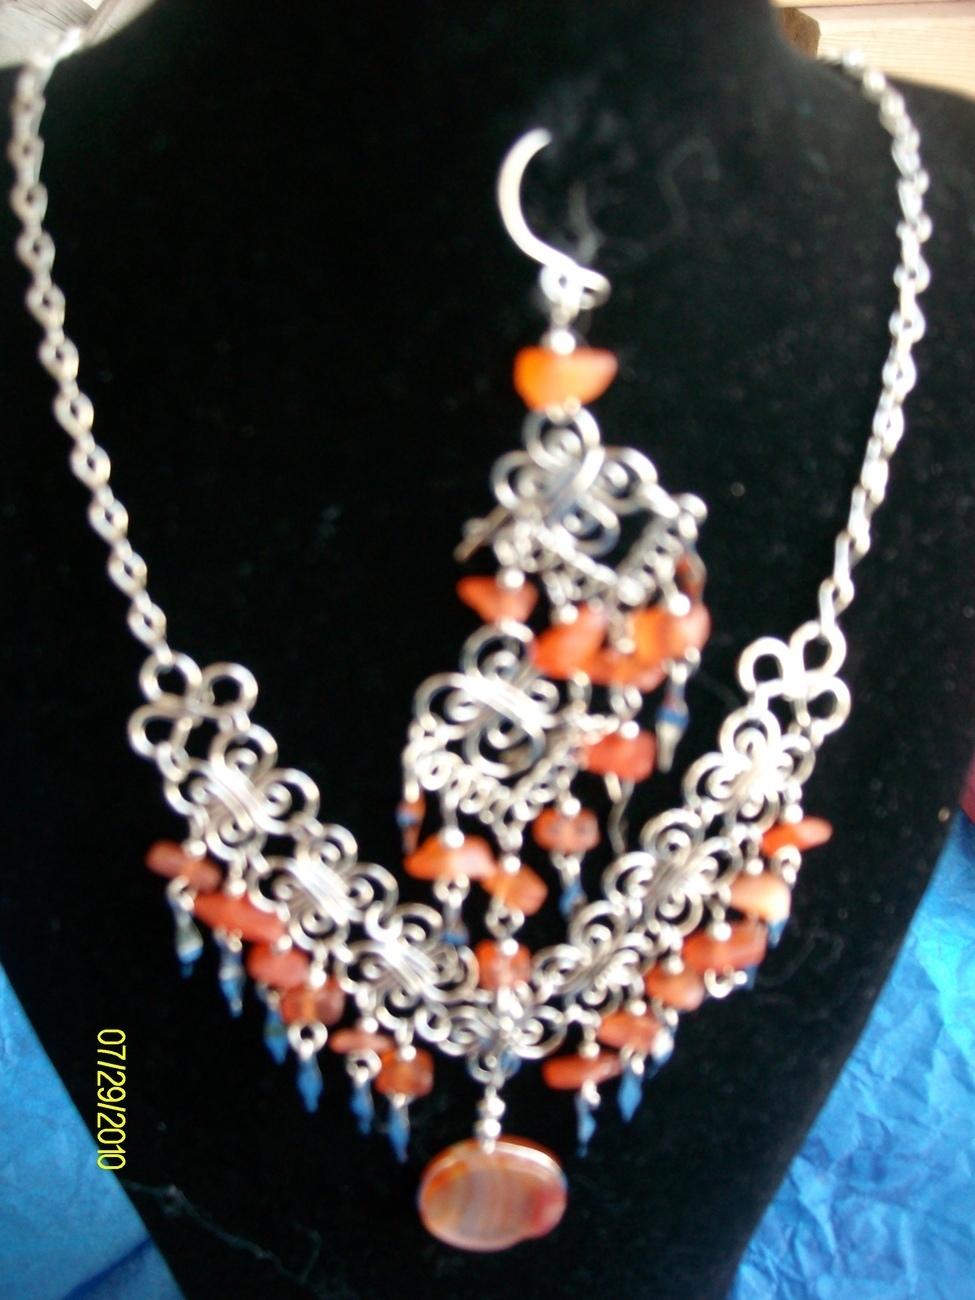 Lt. Orange Alpaca Necklace & Earring Set (S 5) Bonanza